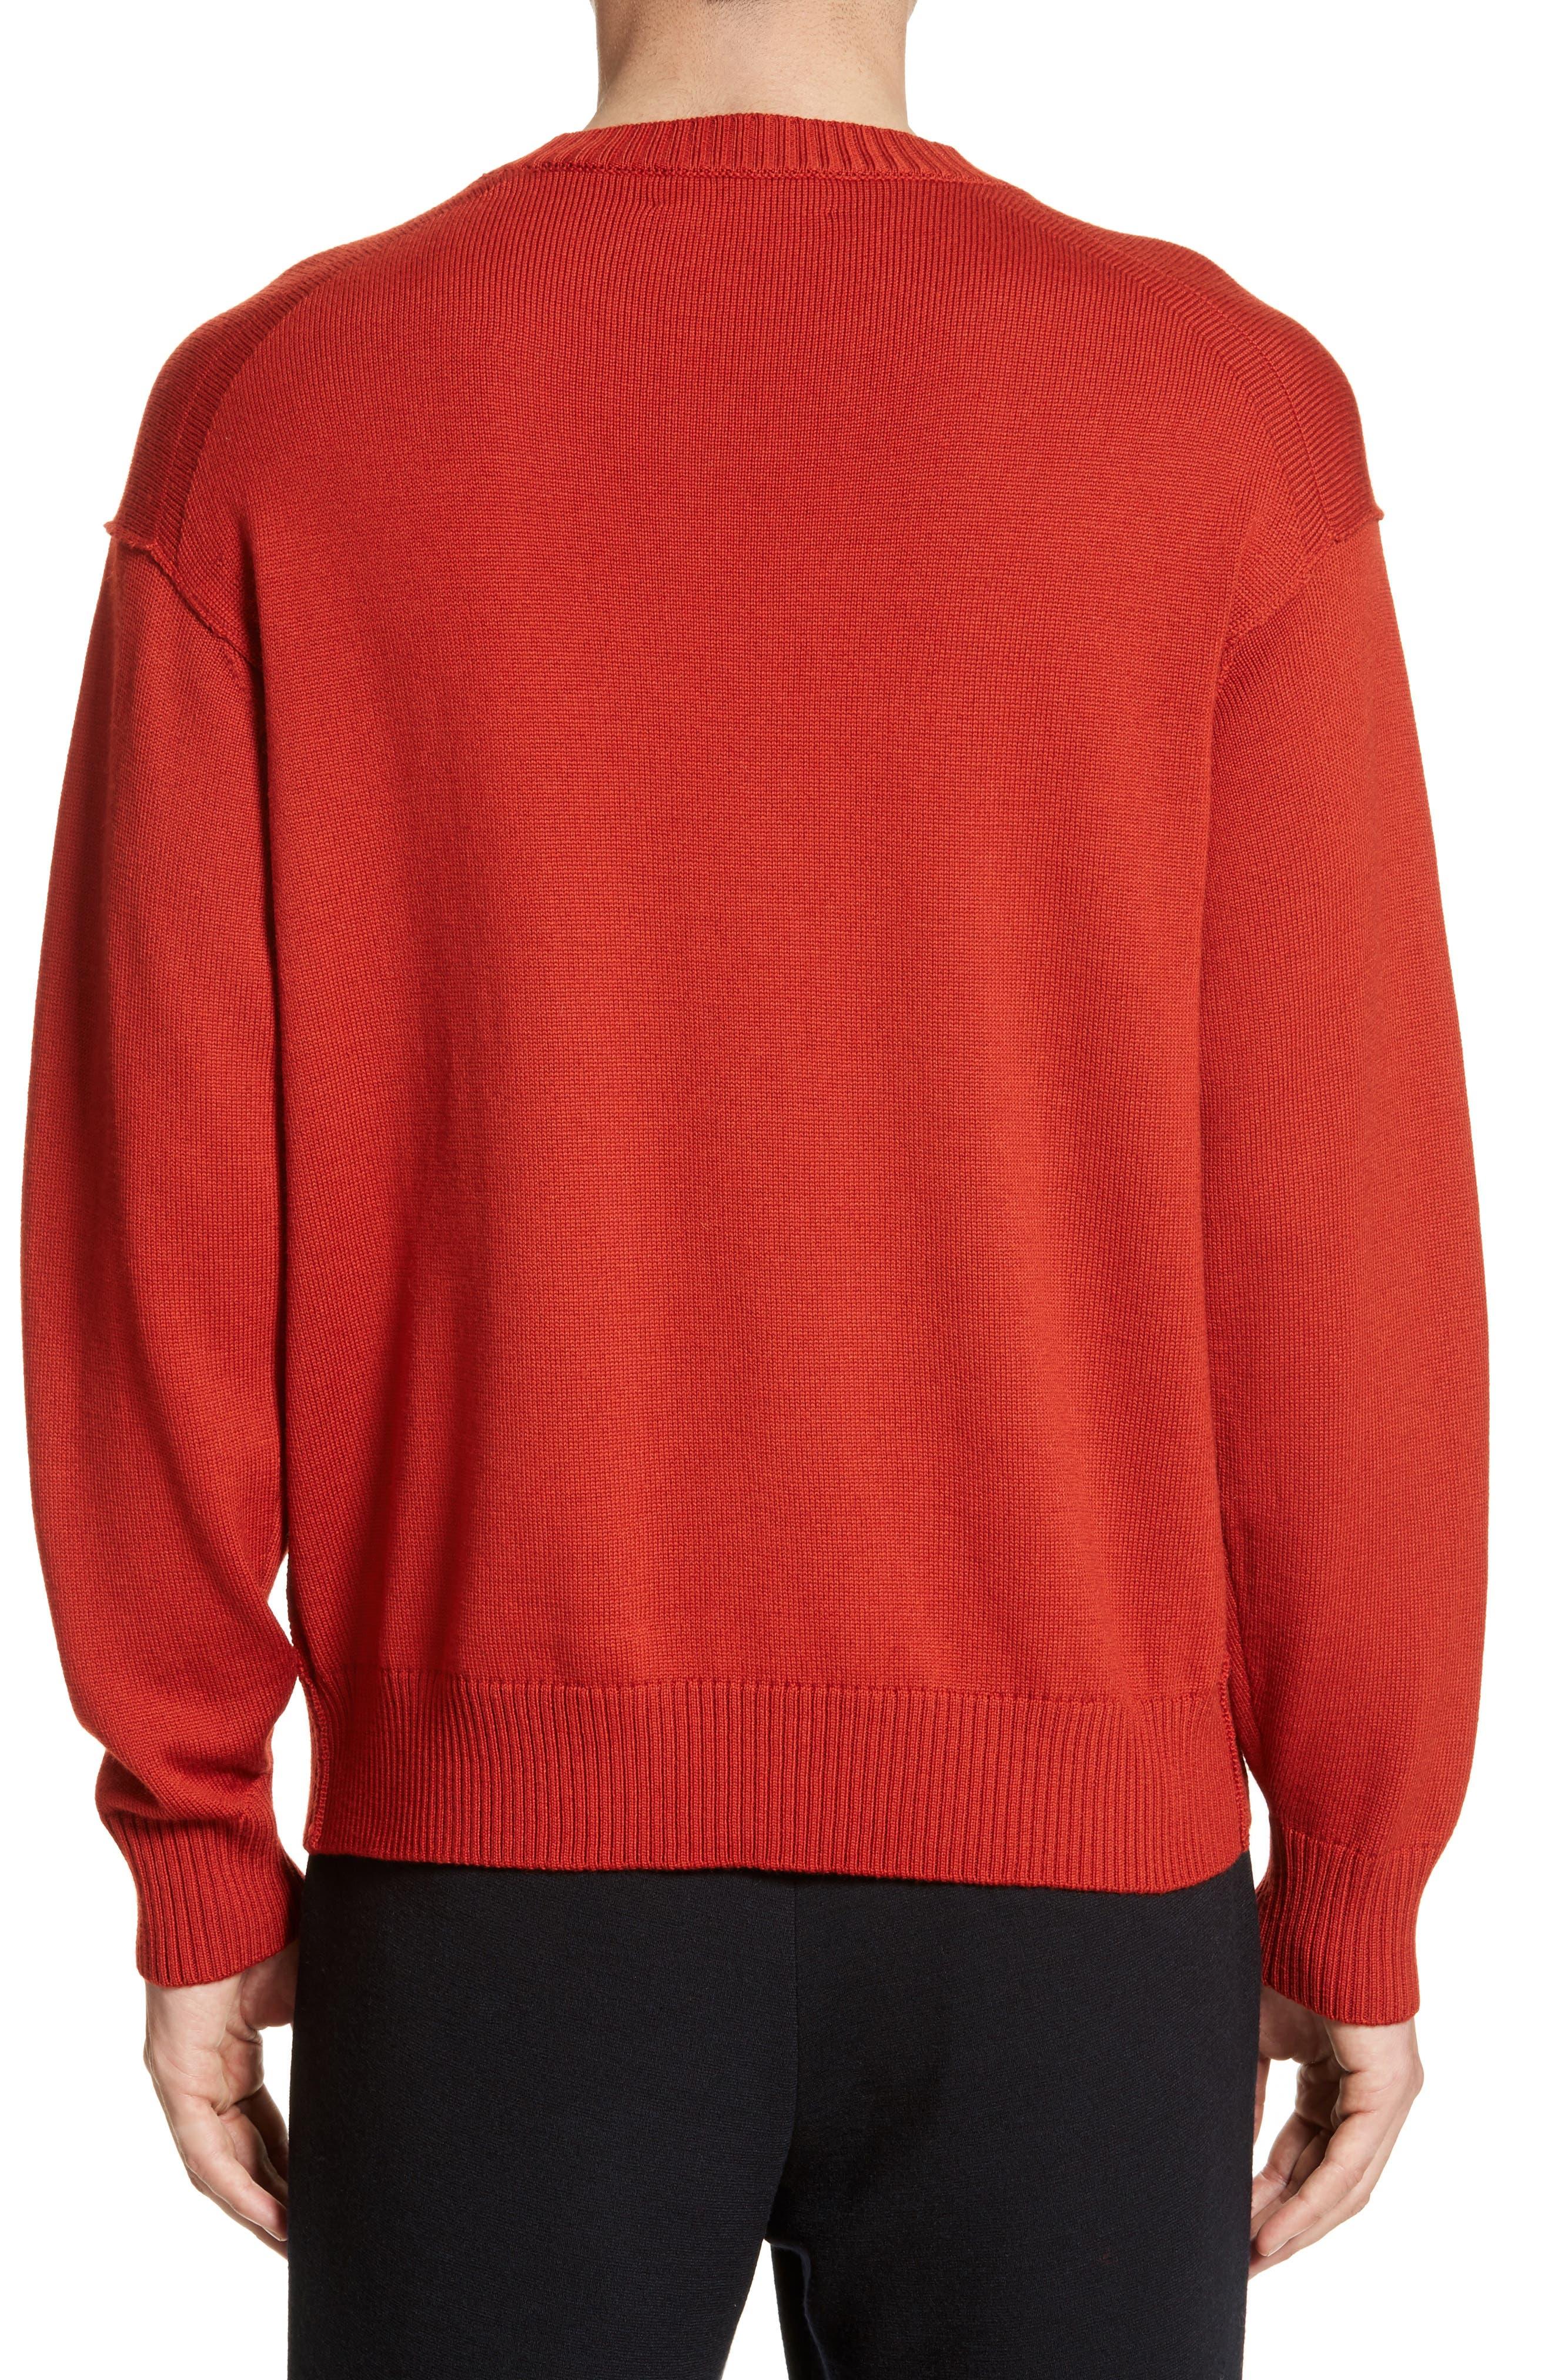 Alternate Image 2  - Tomorrowland Merino Sweater